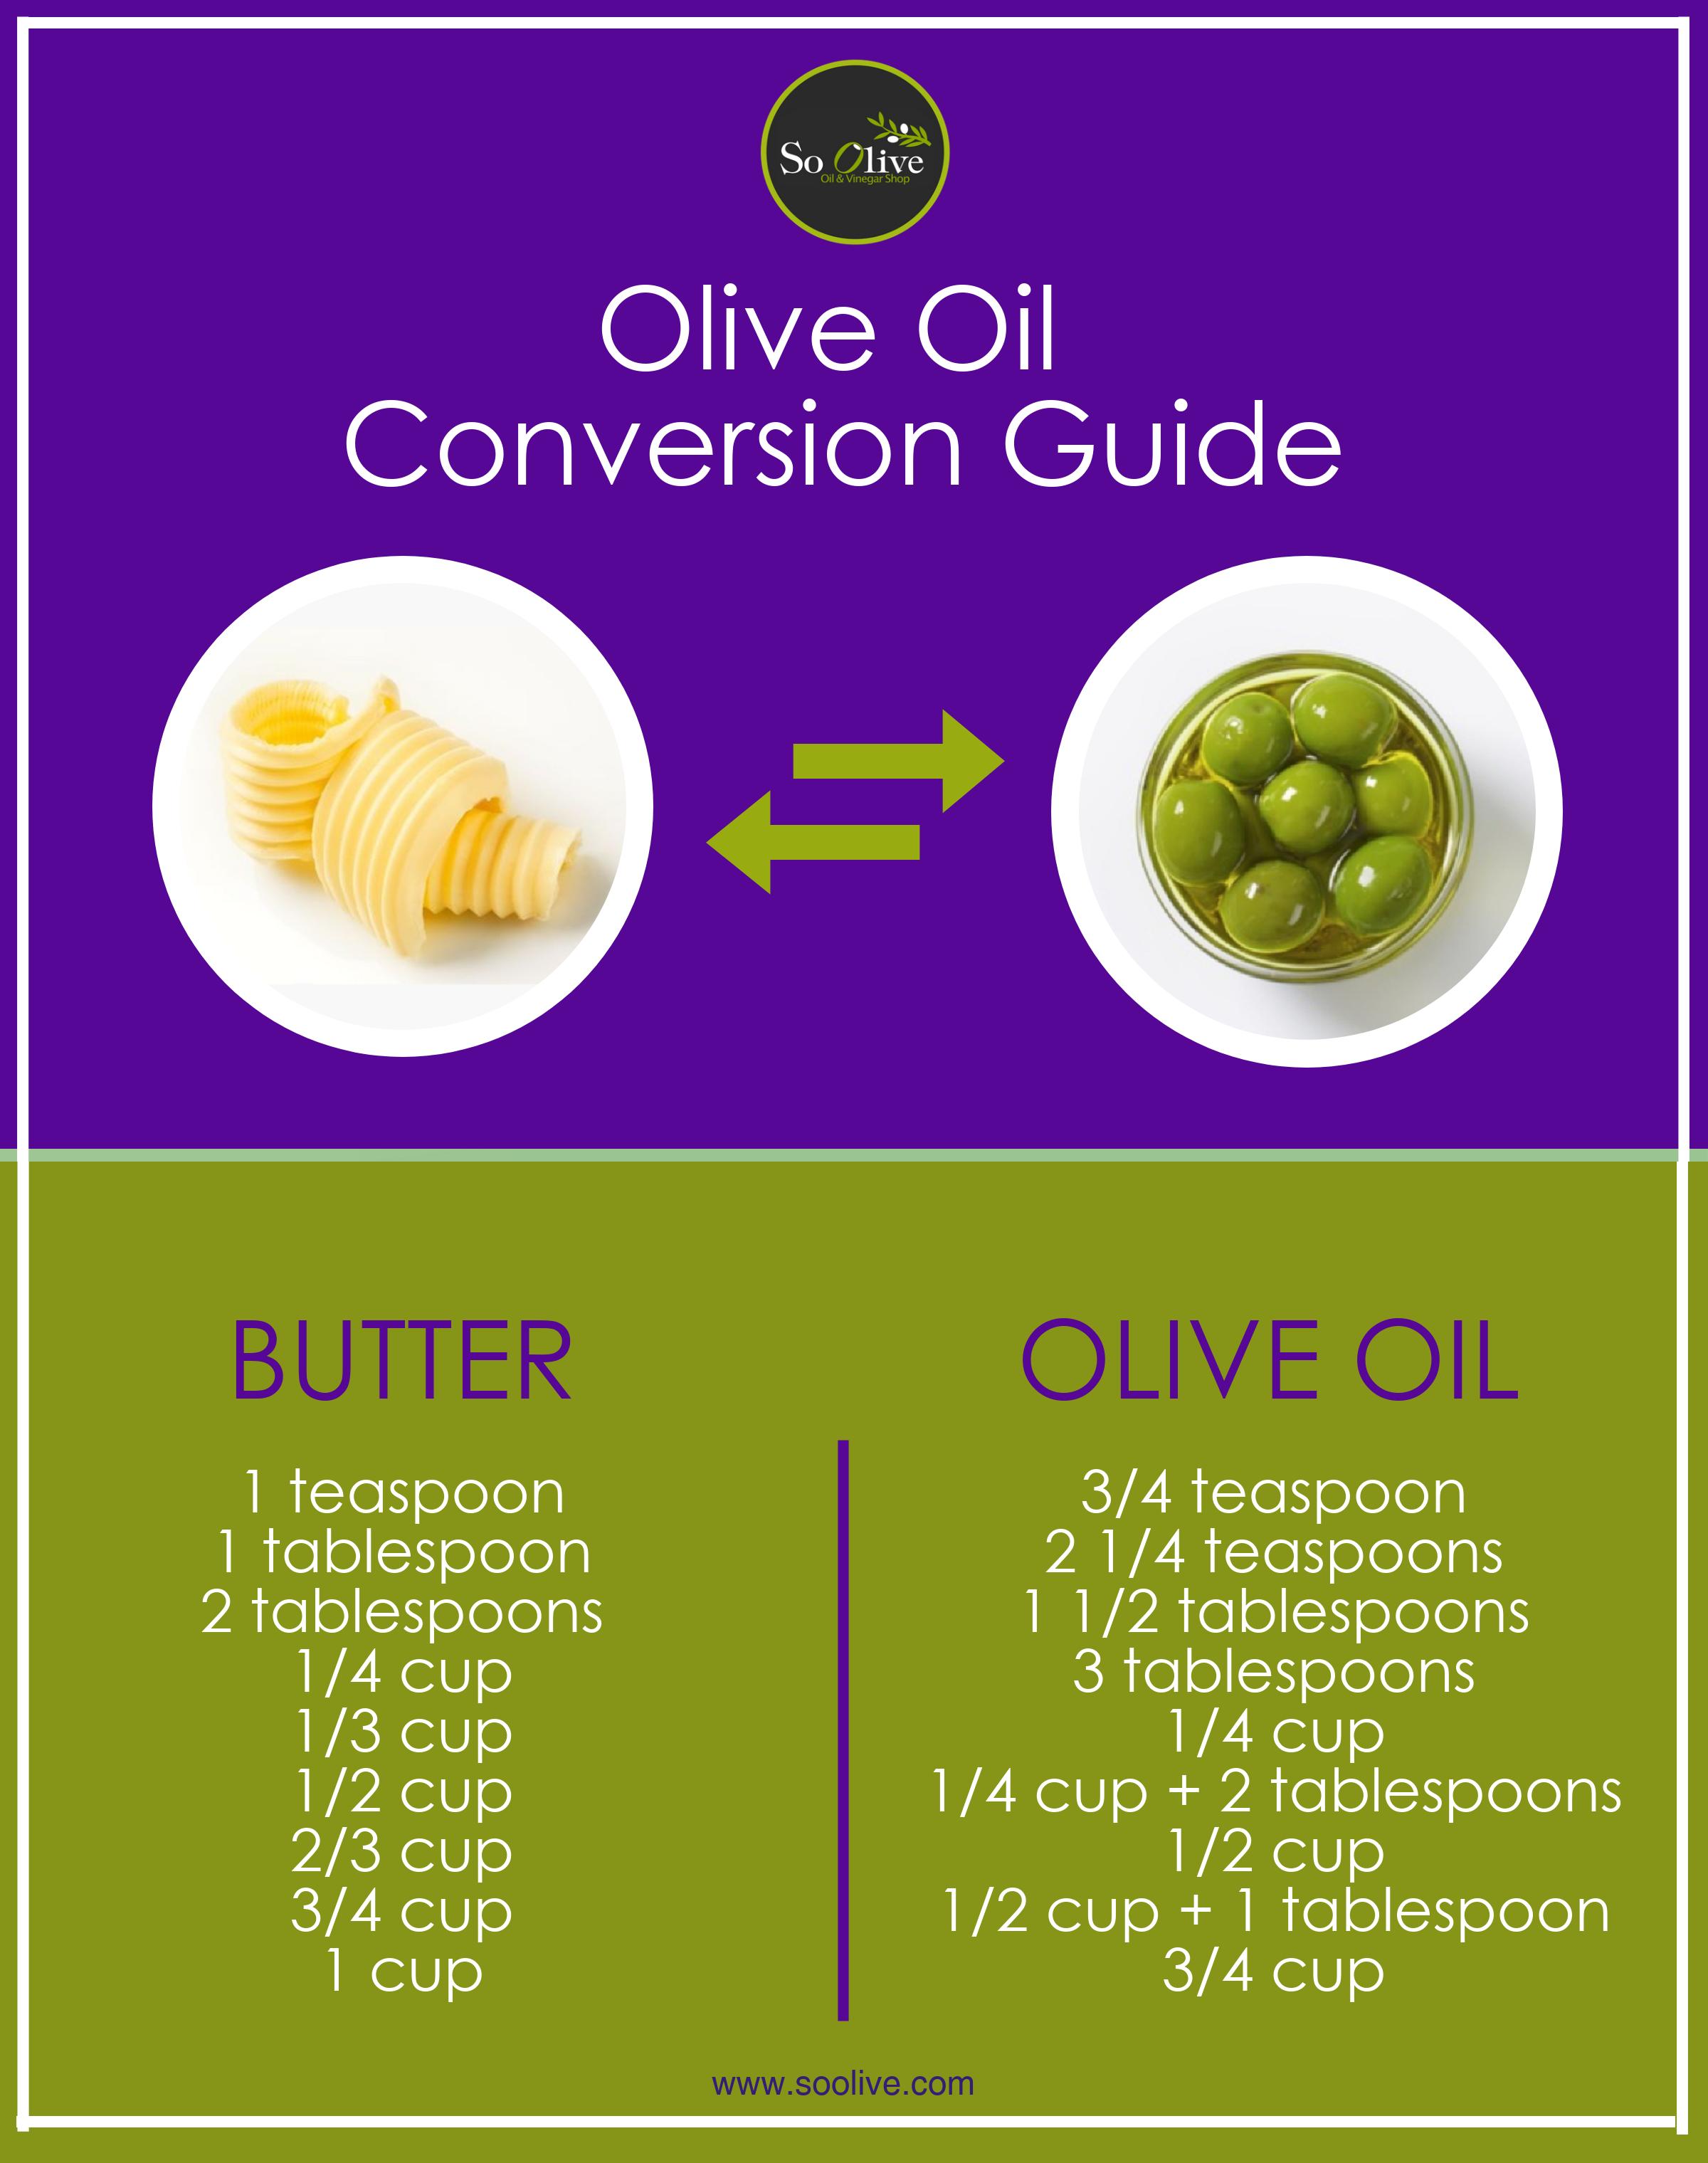 olive-oil-conversion-guide